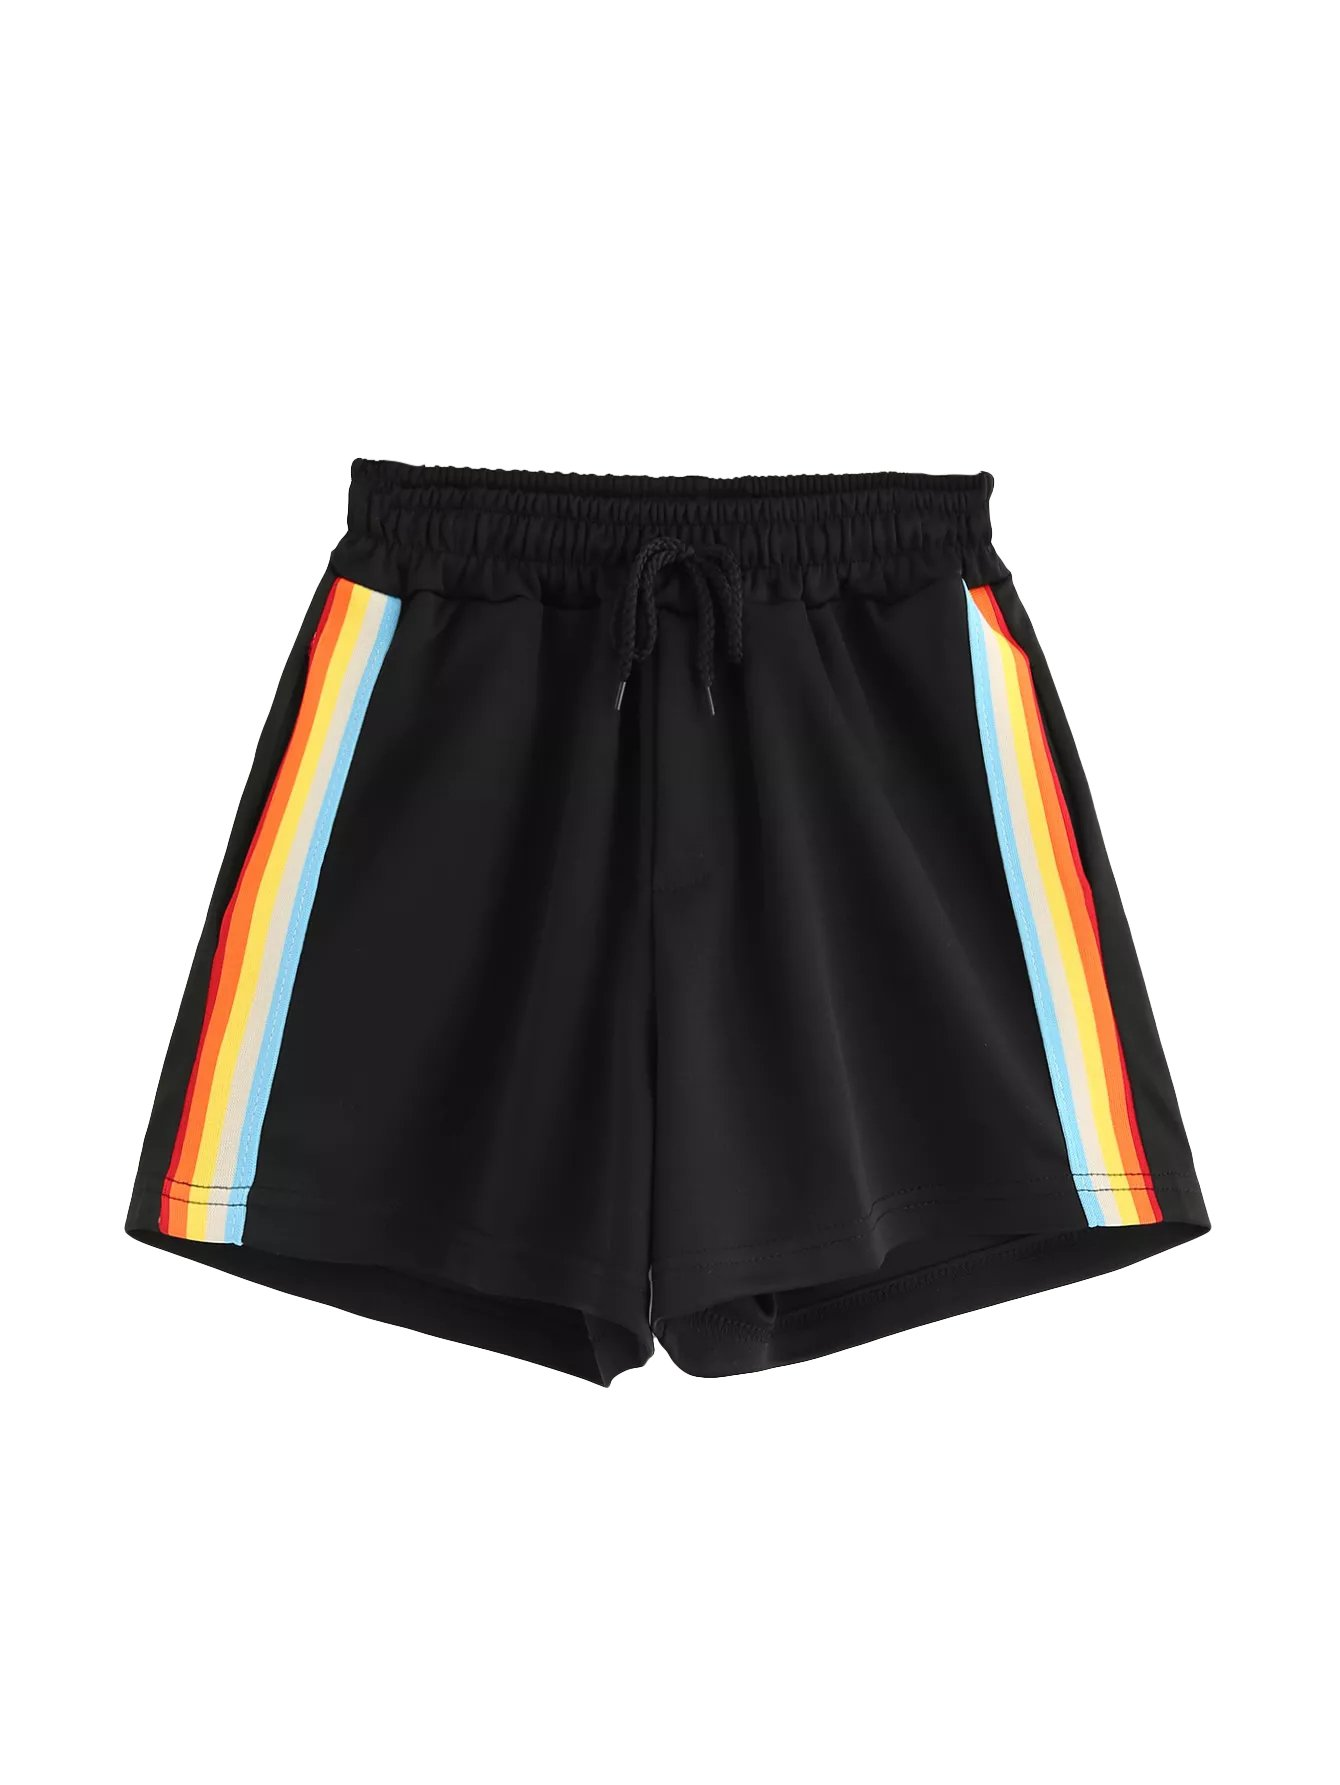 SweatyRocks Women Summer Casual Sports Workout Shorts Drawstring Elastic Waiste Hot Shorts Black #2 L